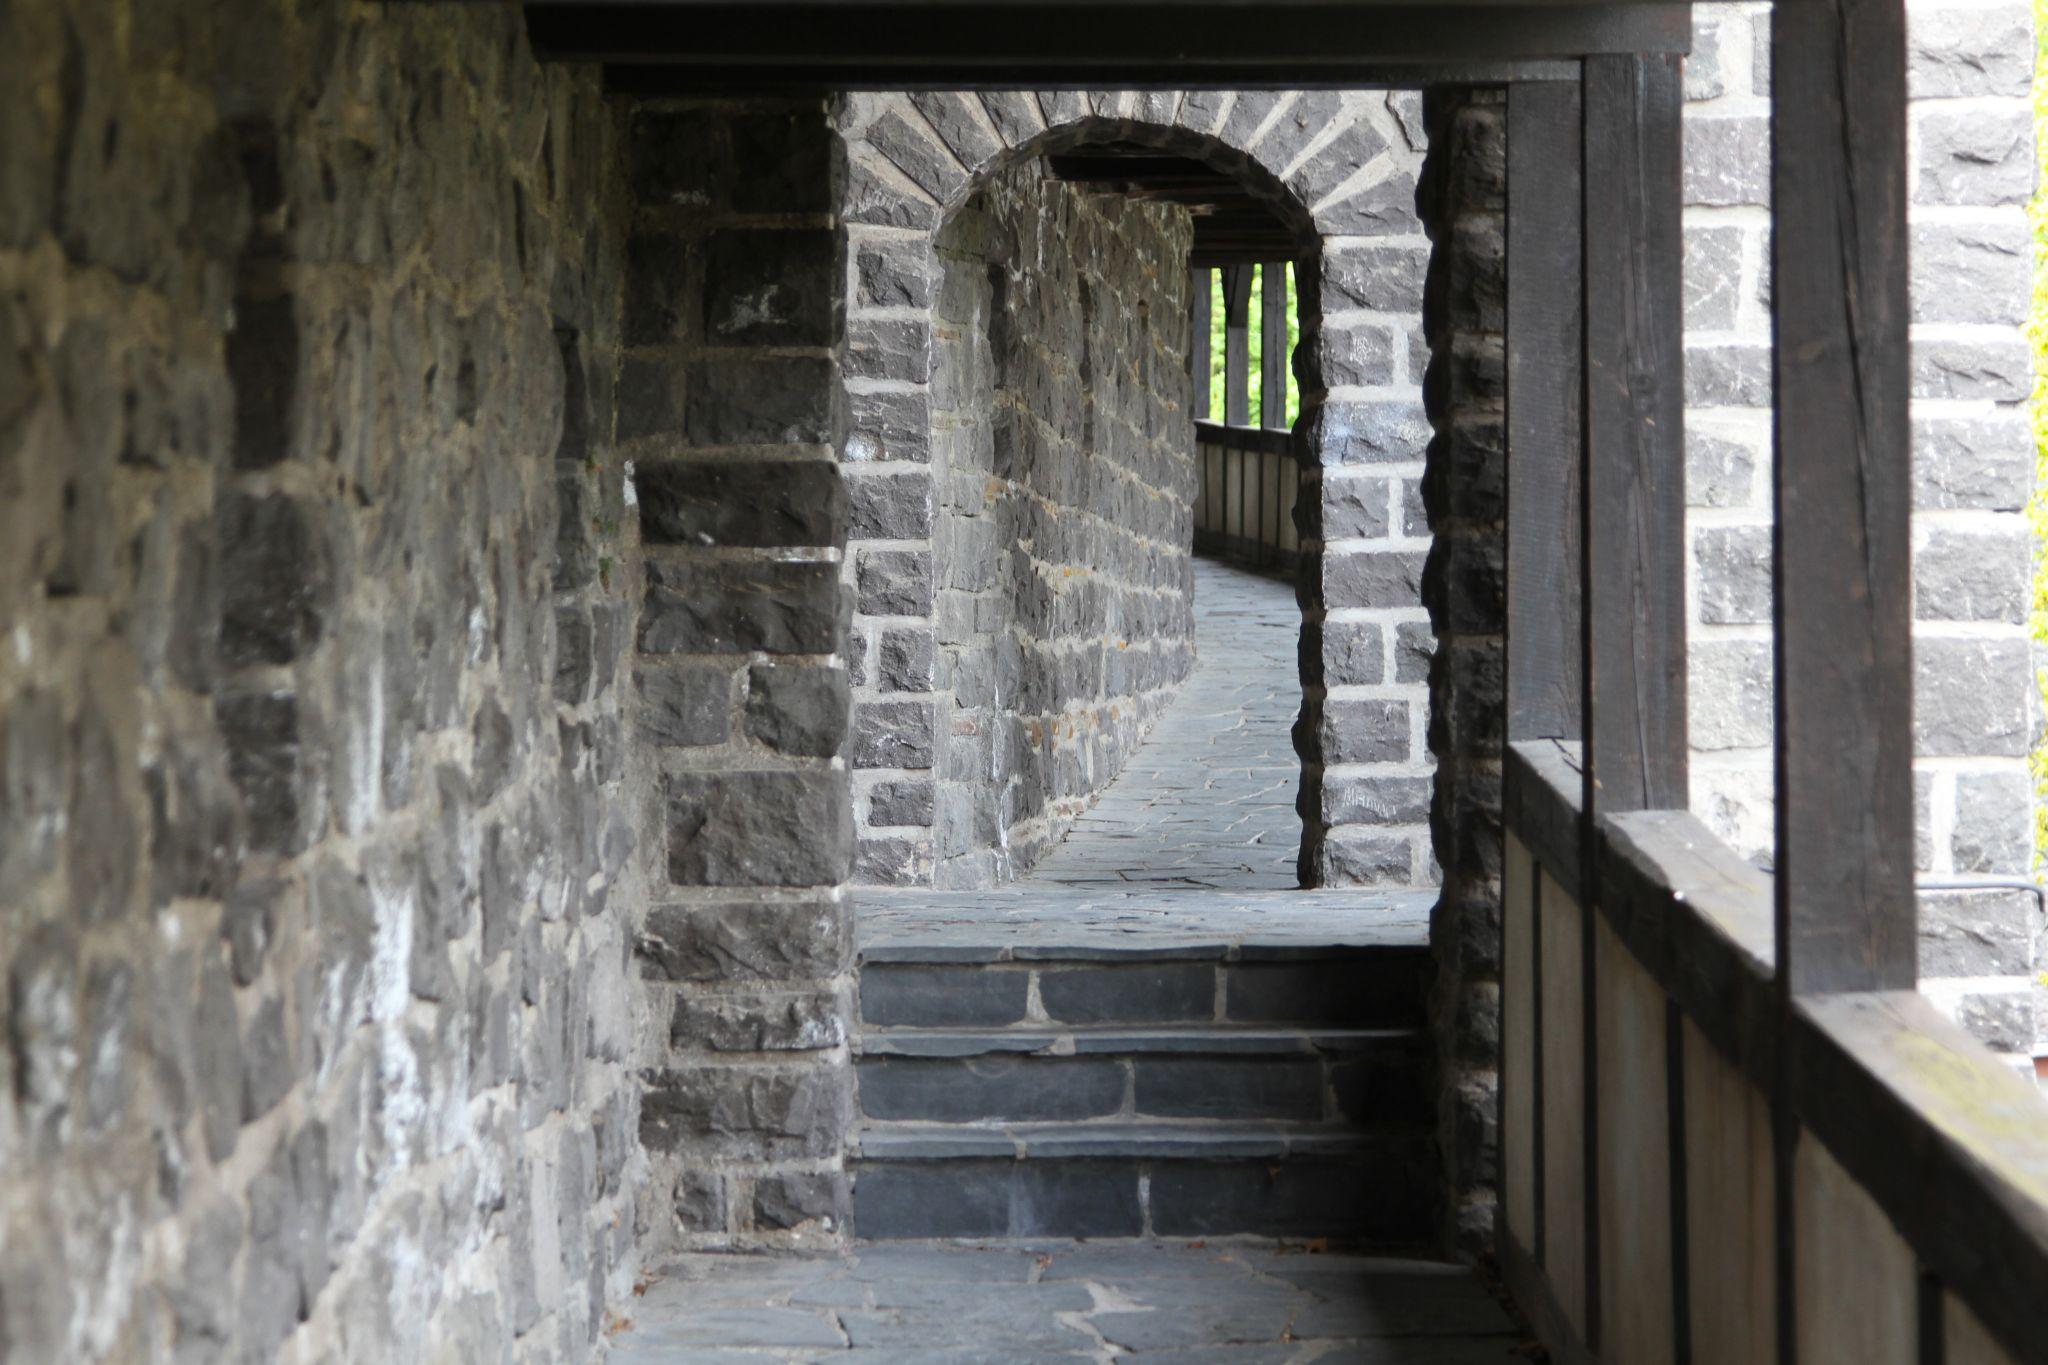 Stadtmauer Mayen, Eifel, Germany, Germany